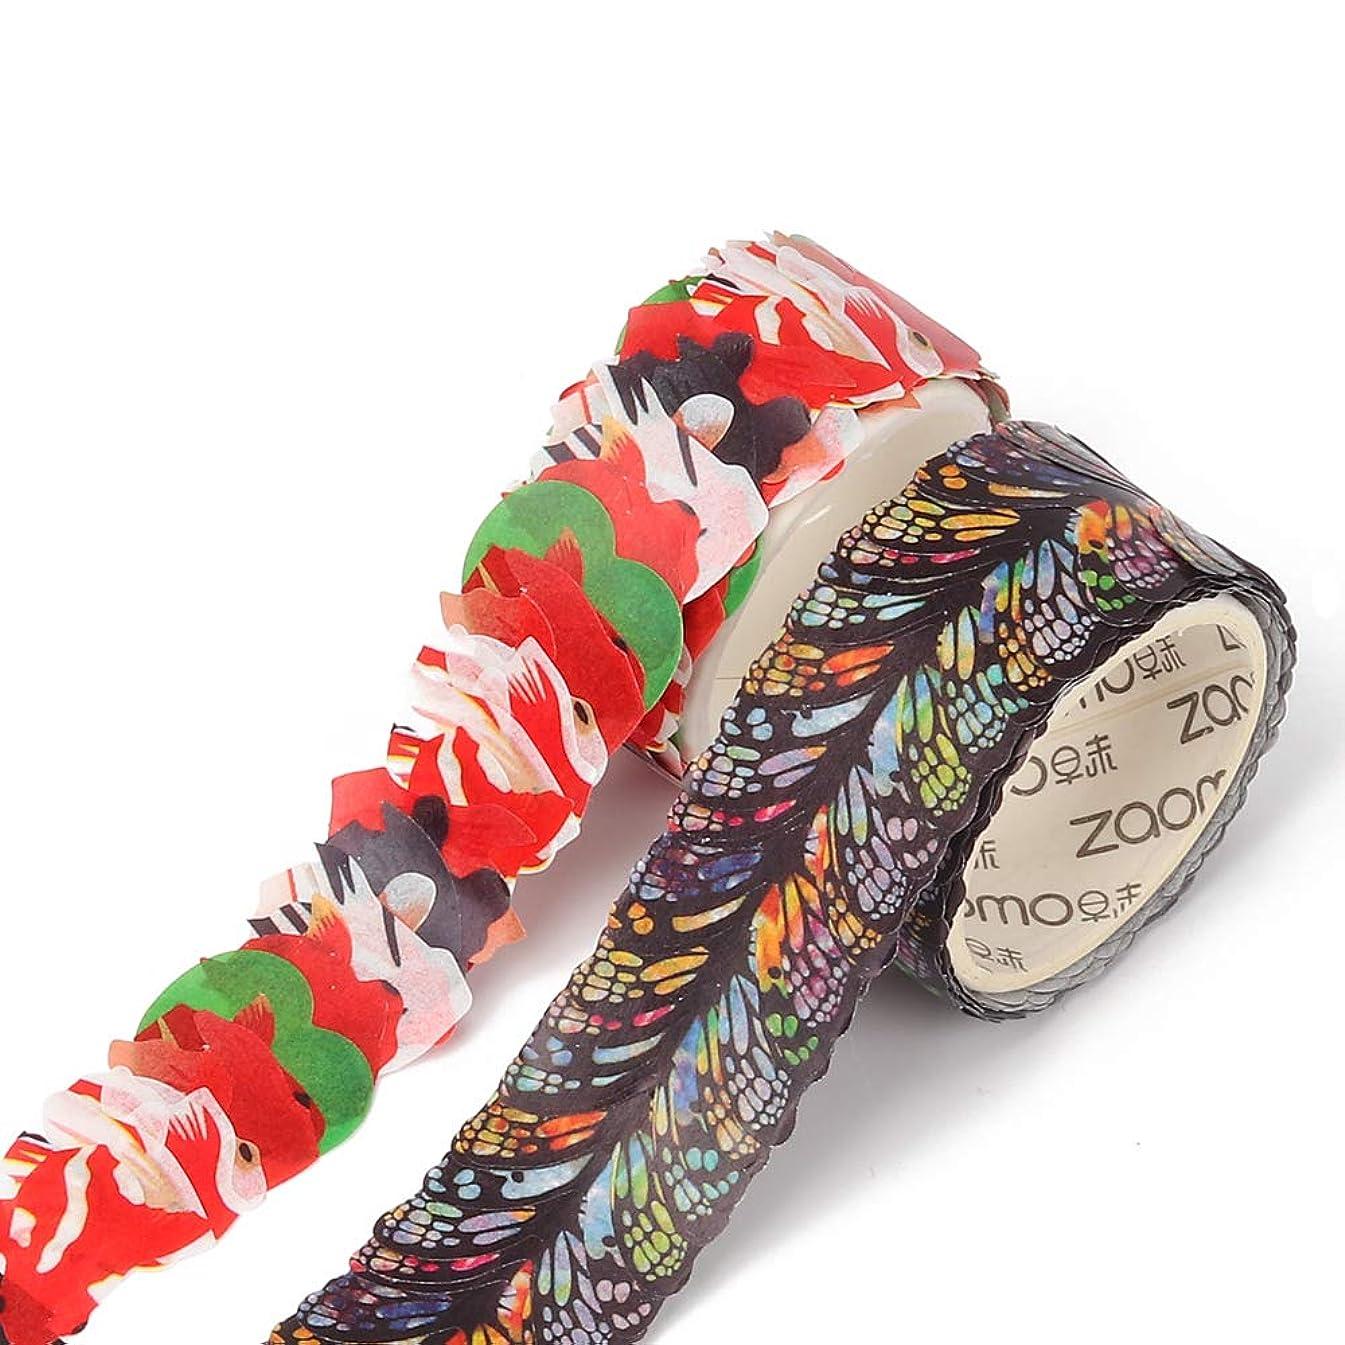 Molshine 2 Roll Creative Floral Petal Washi Tape, Masking Tape Decorative Decals,Crafts DIY Petal Stickers for Scrapbooking, Bullet Journal, Planner, 200 Petals/Roll (Goldfish & Butterflies)